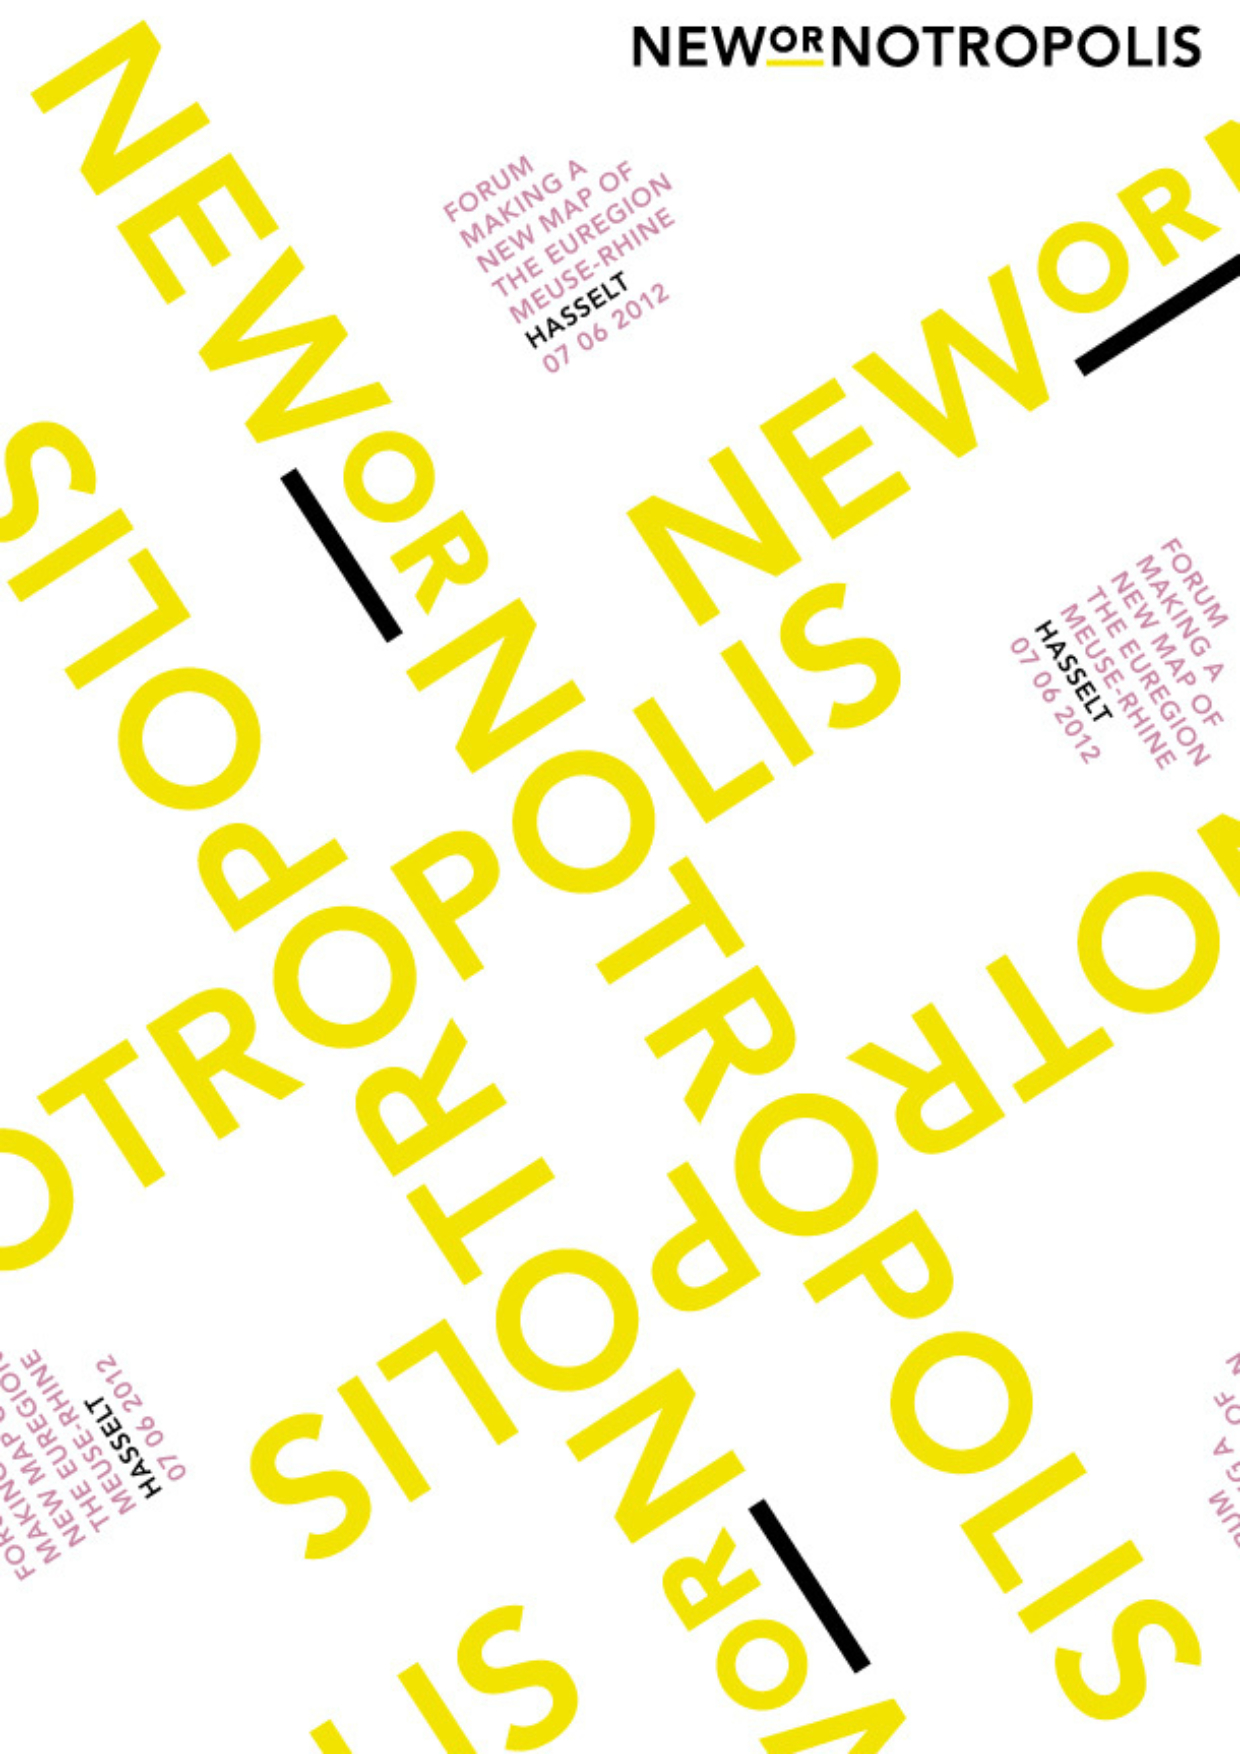 Affiches NEWorNOtropolis